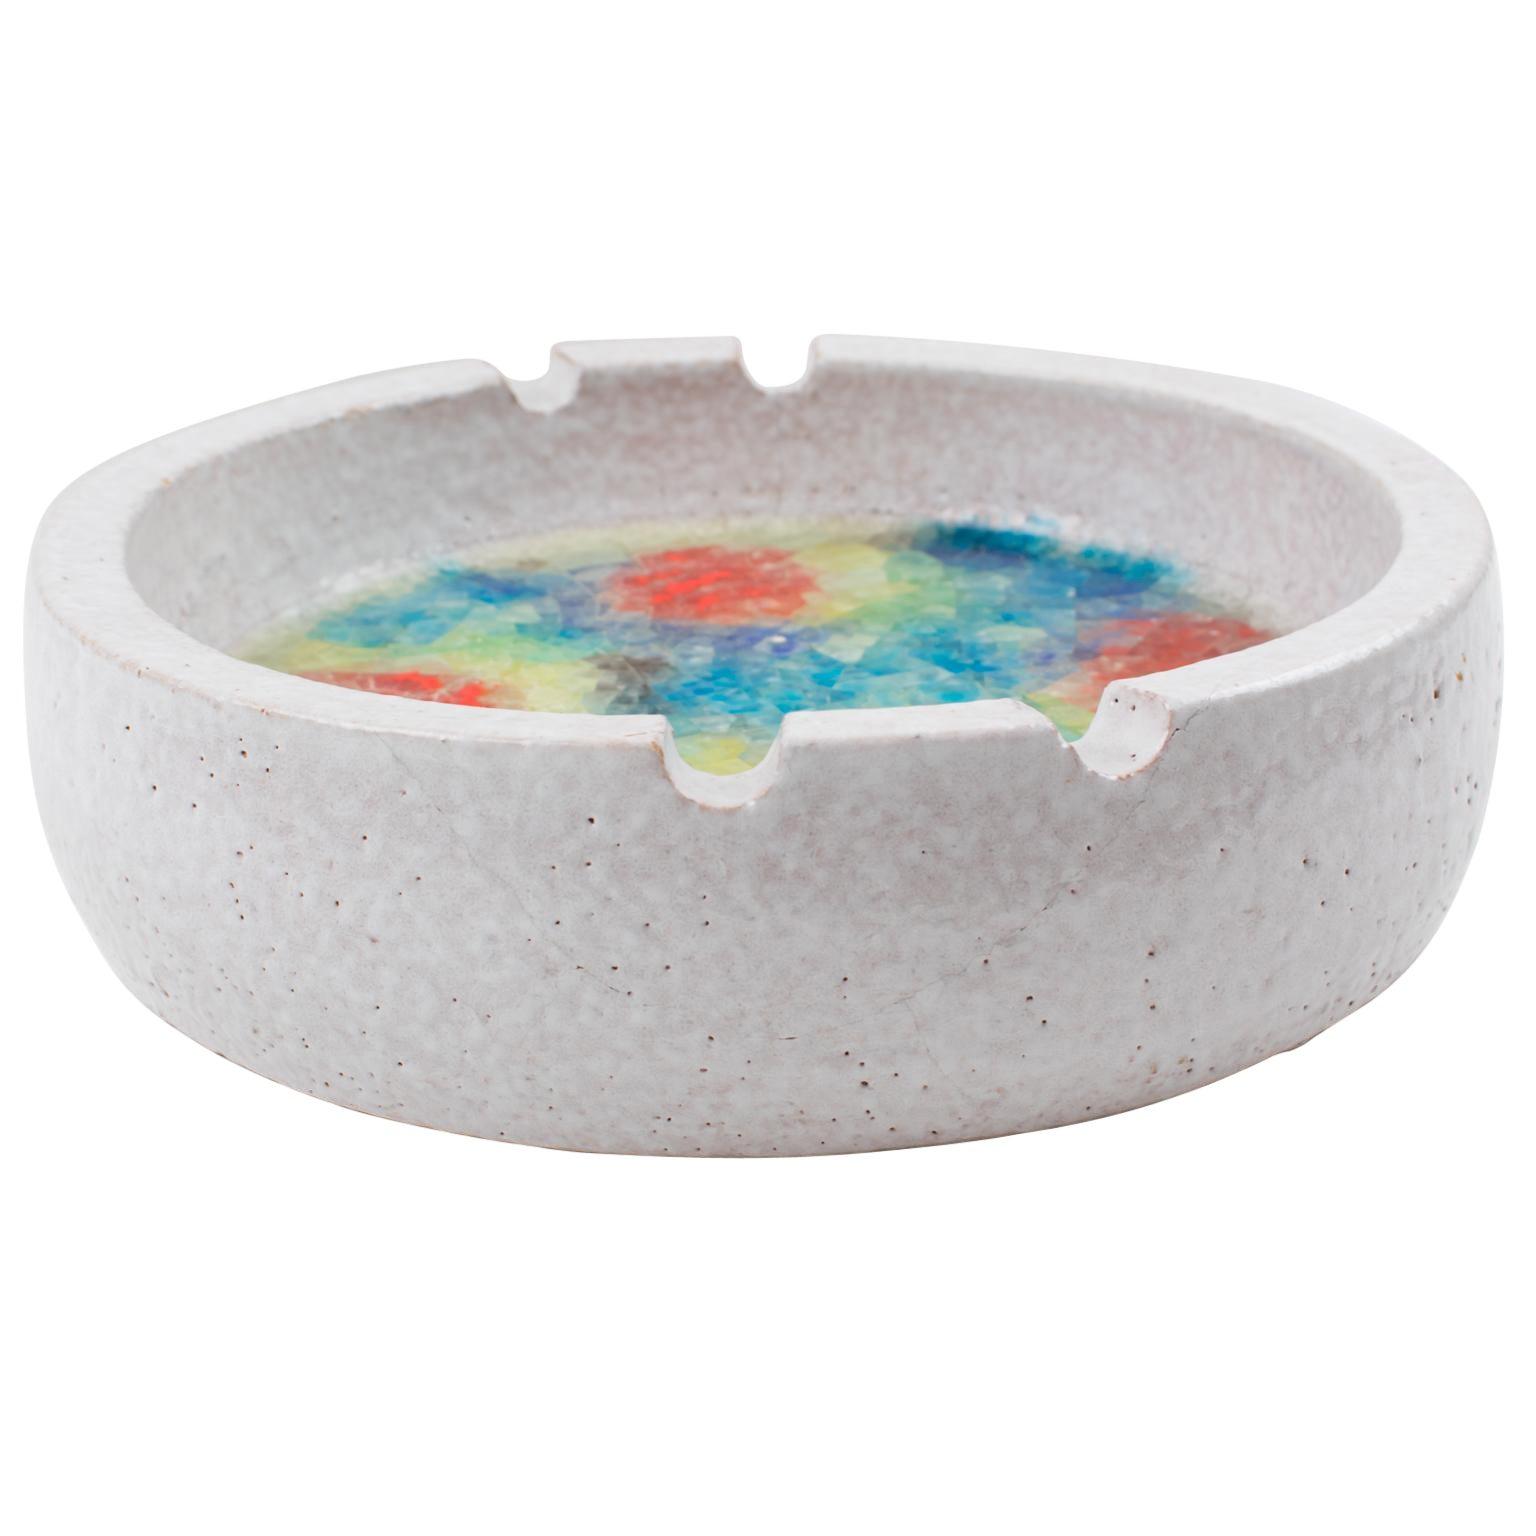 Bitossi Italy for Raymor Glaze Ceramic Ashtray Bowl with Glass Mosaic